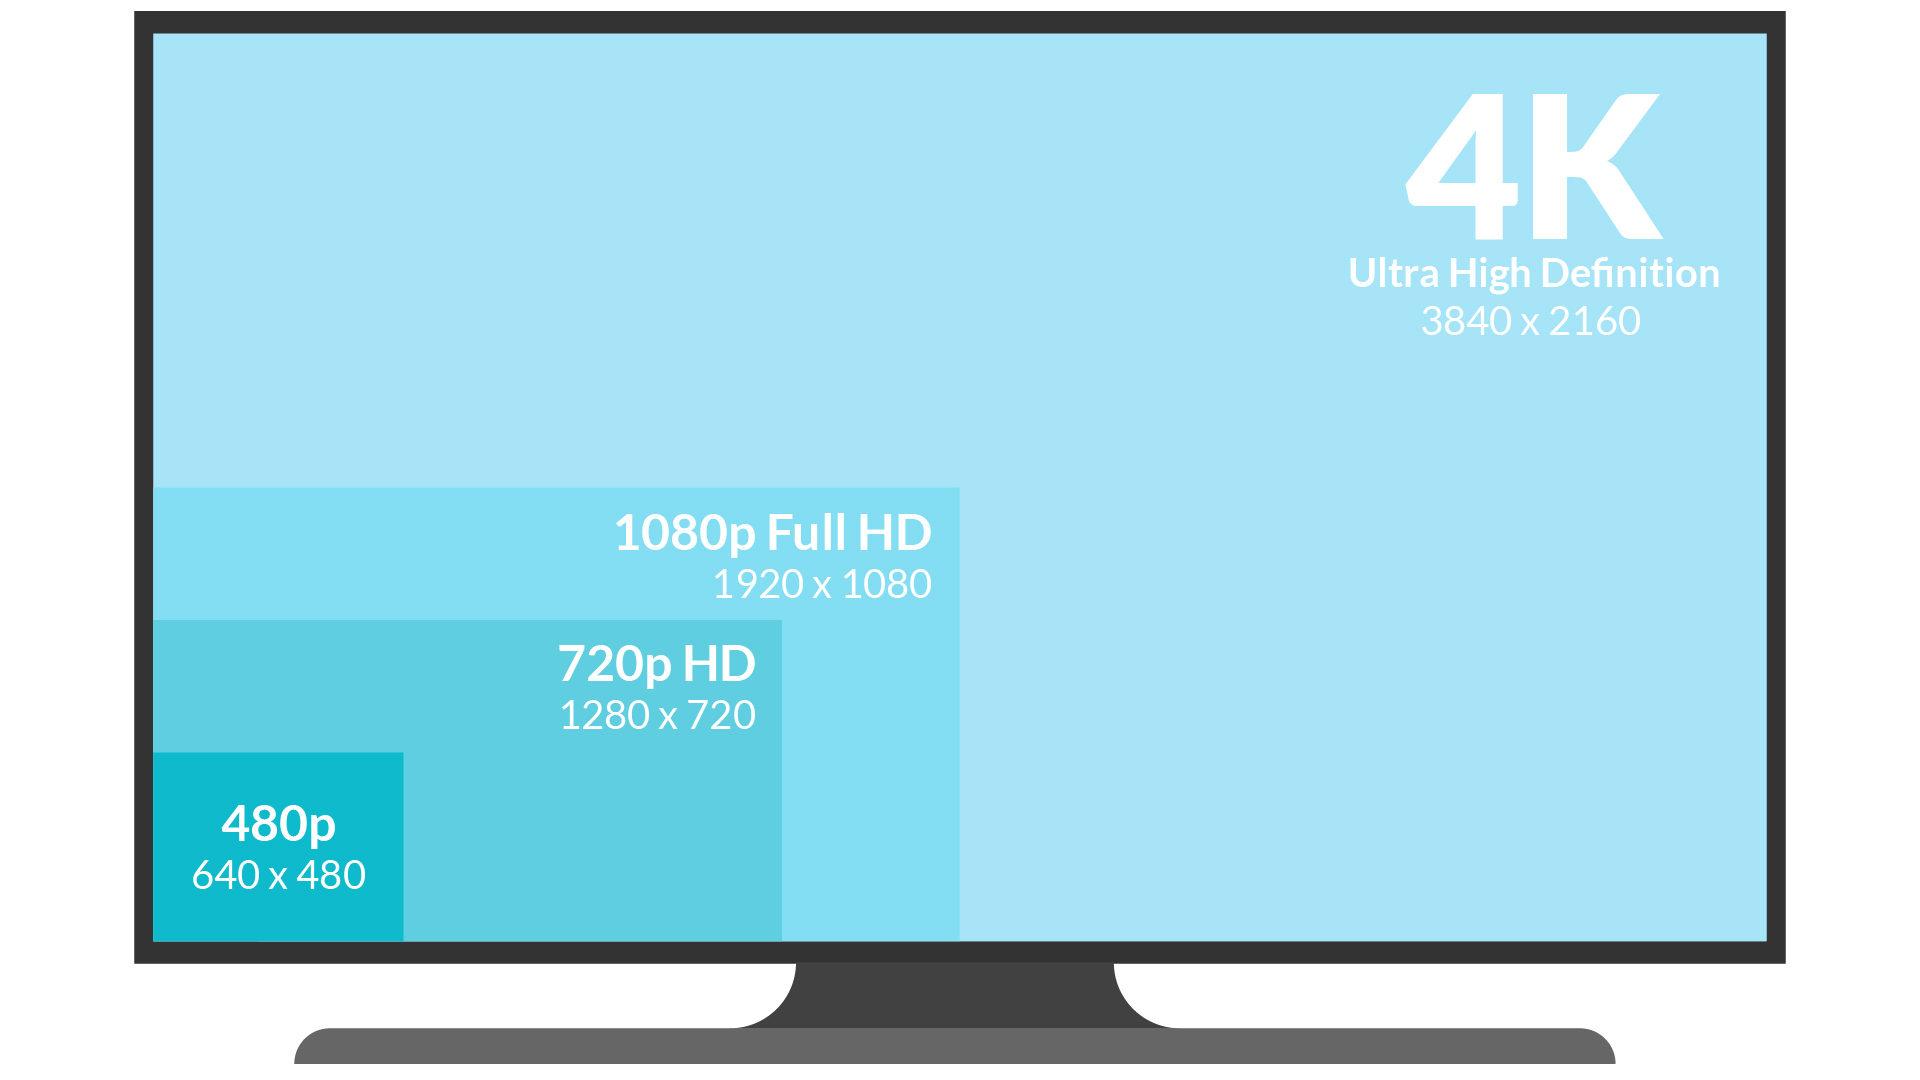 4K vs 1080p vs 720p vs 480p resolution scaling comparison